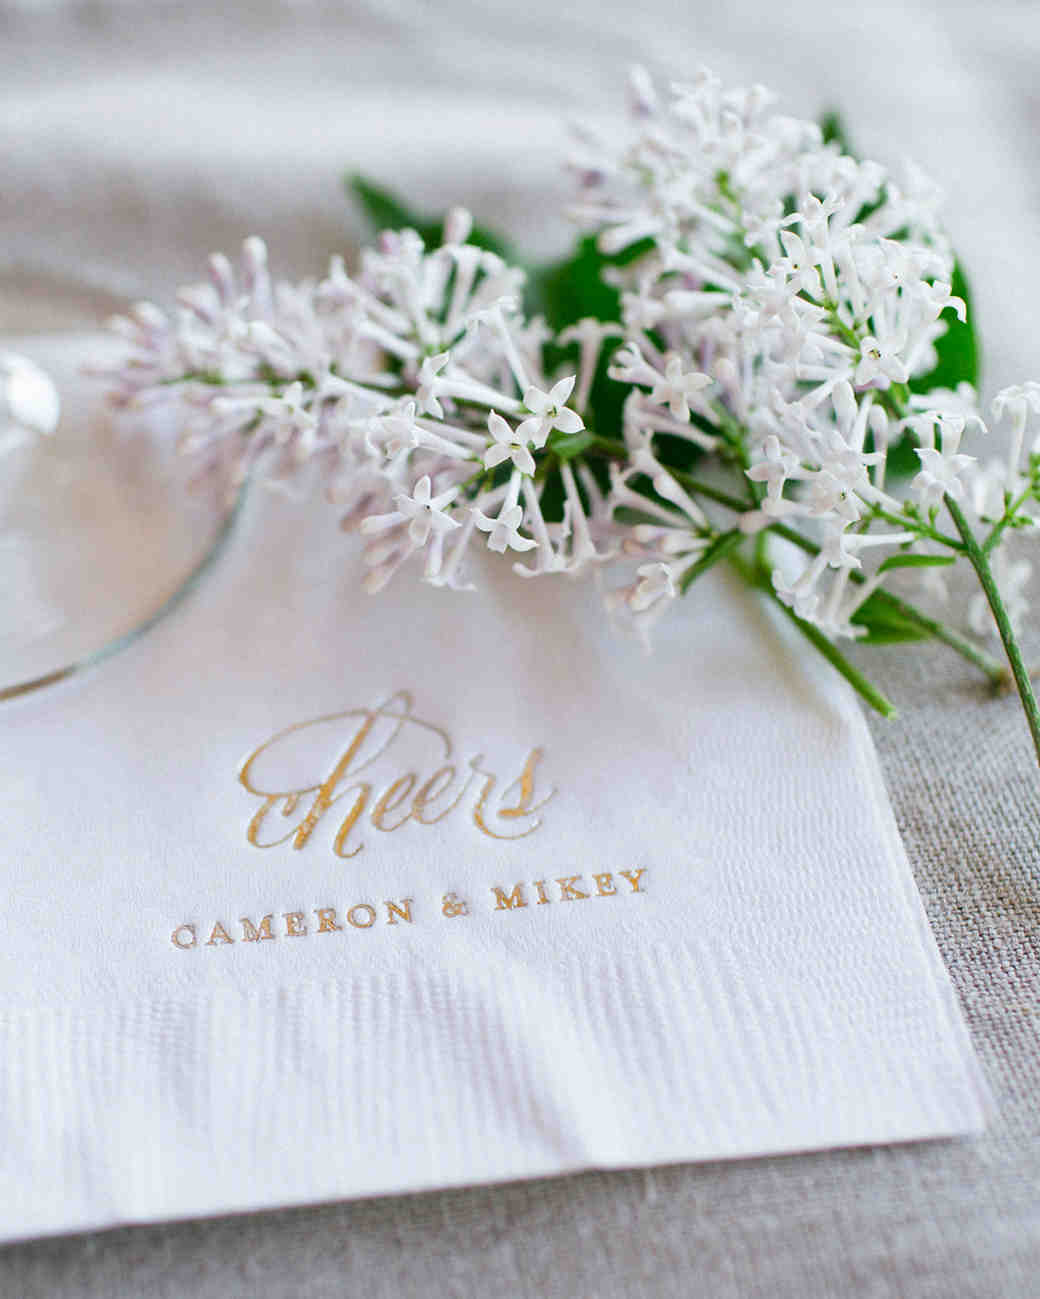 mikey-cameron-rw0812-0603.jpg